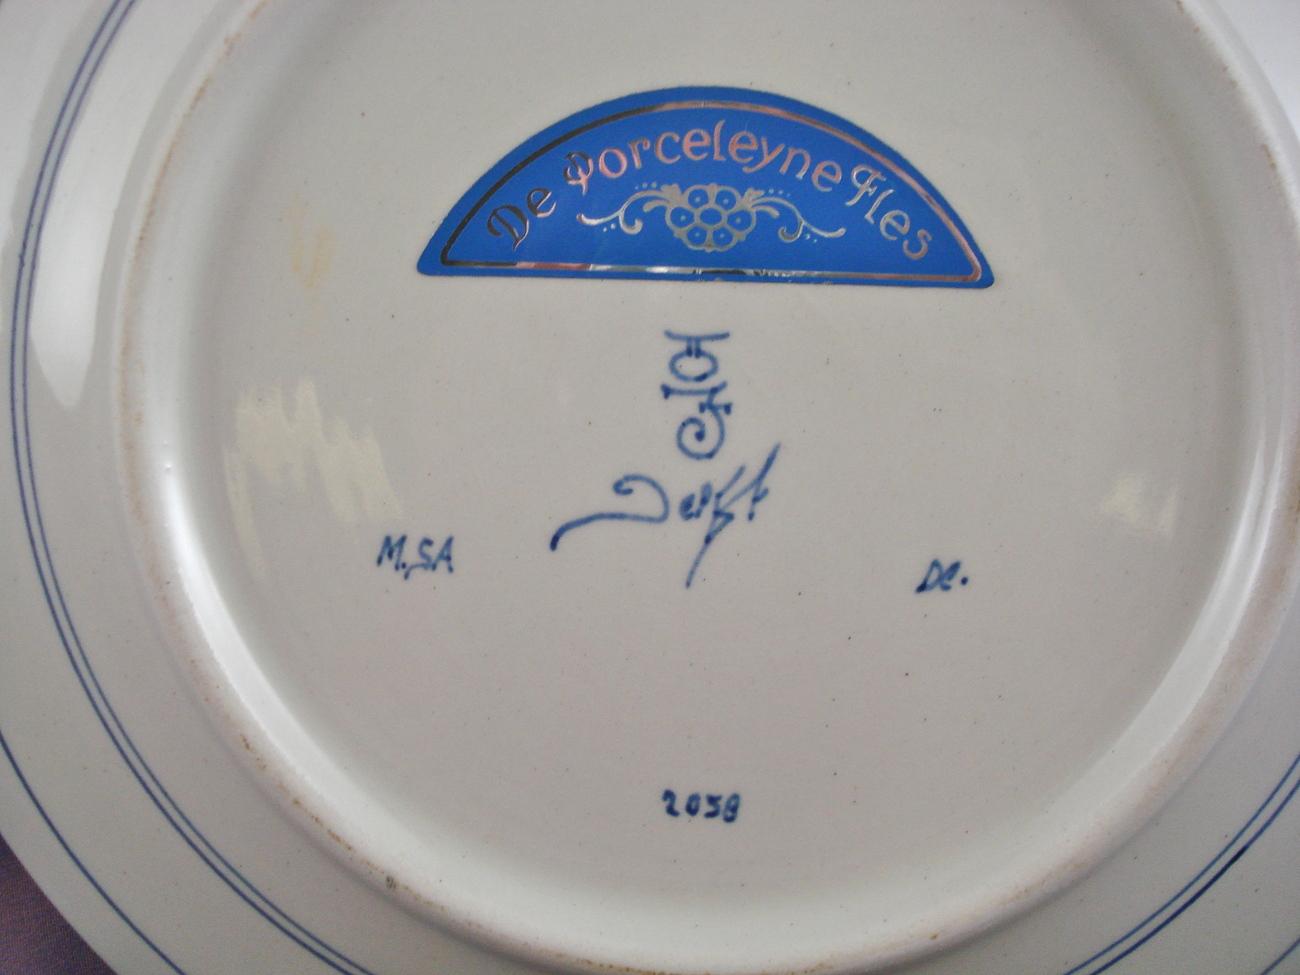 De Porceleyne Fles Delftware plate #2058